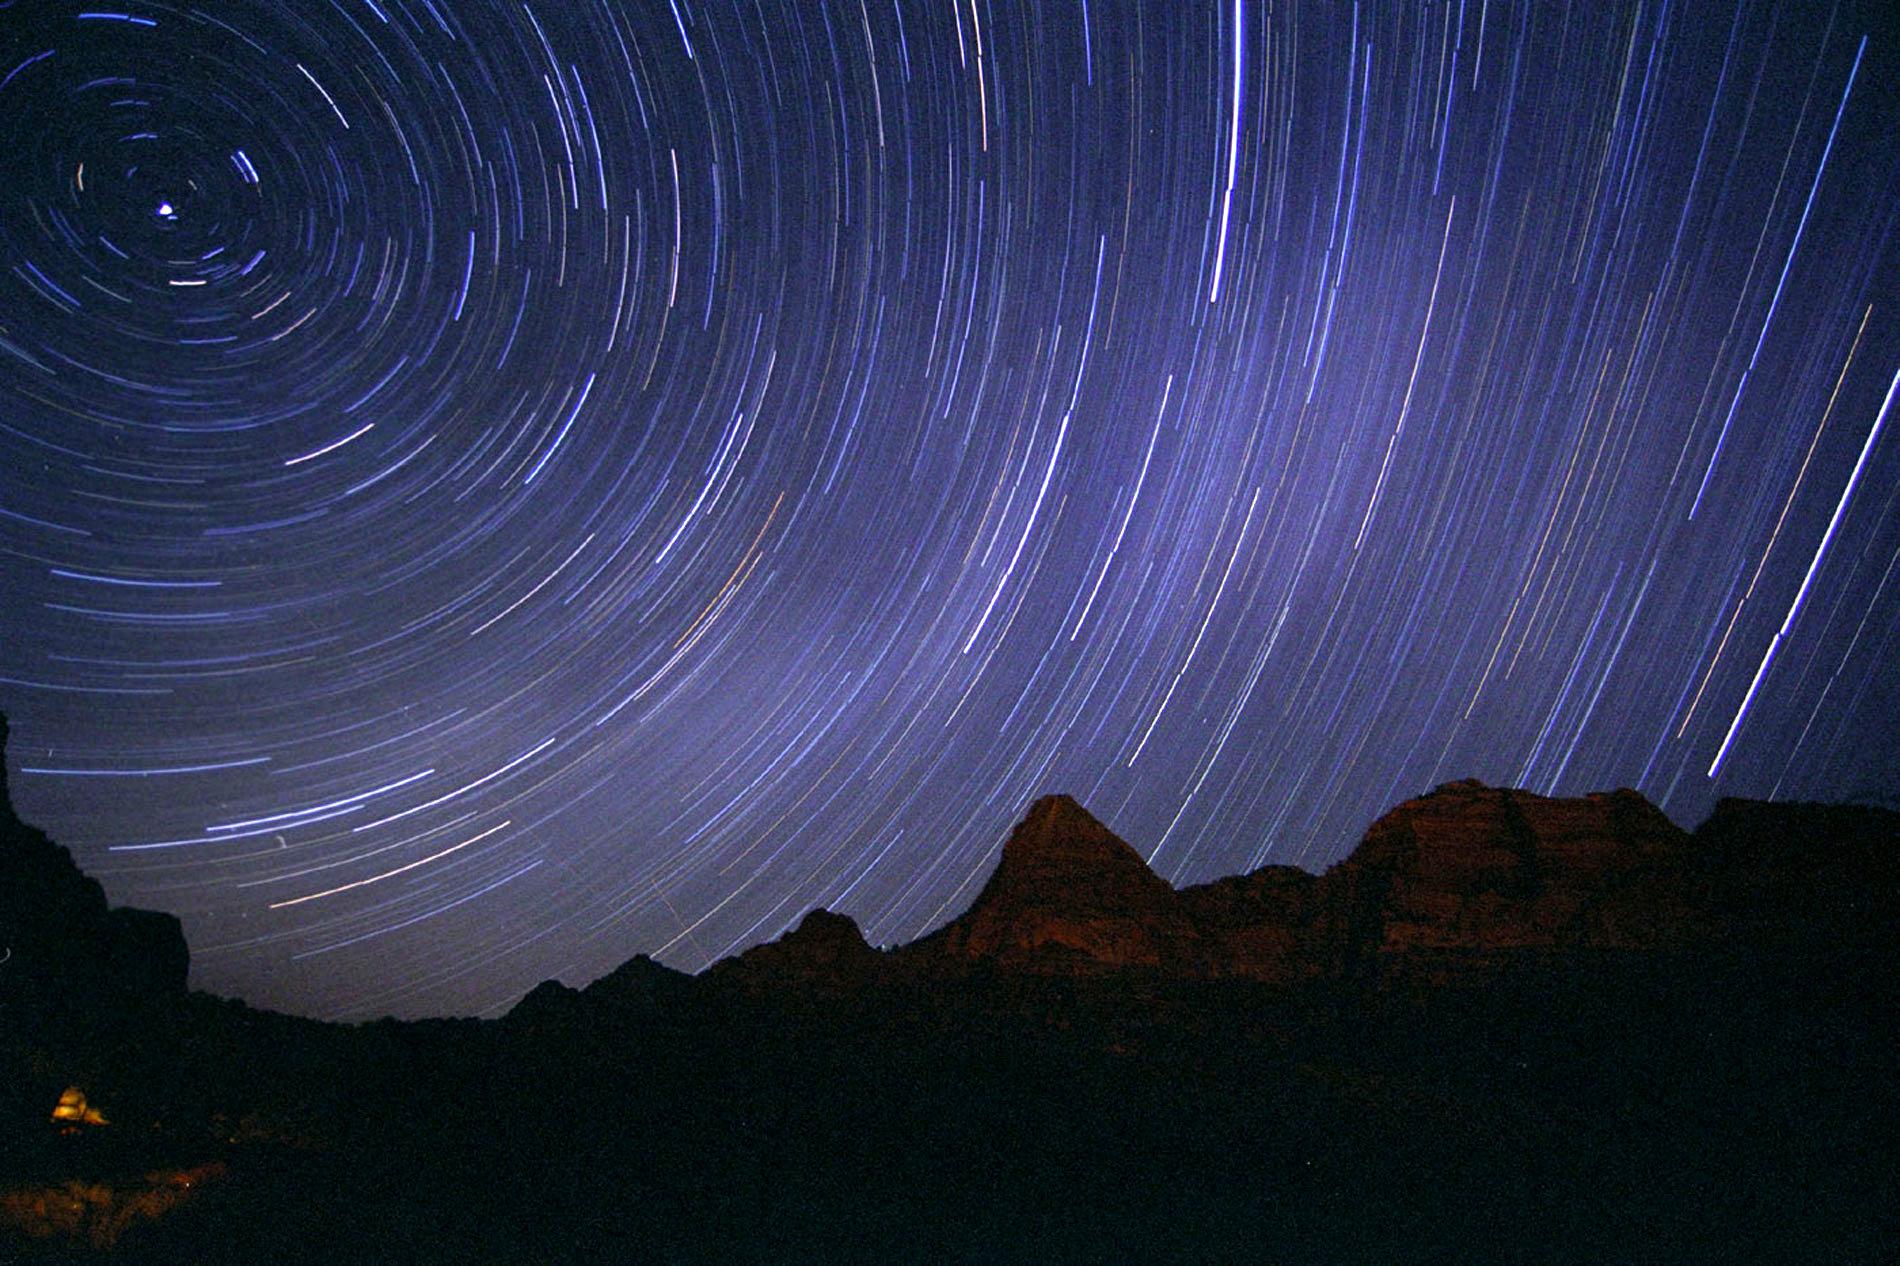 Star Trails - Zion National Park